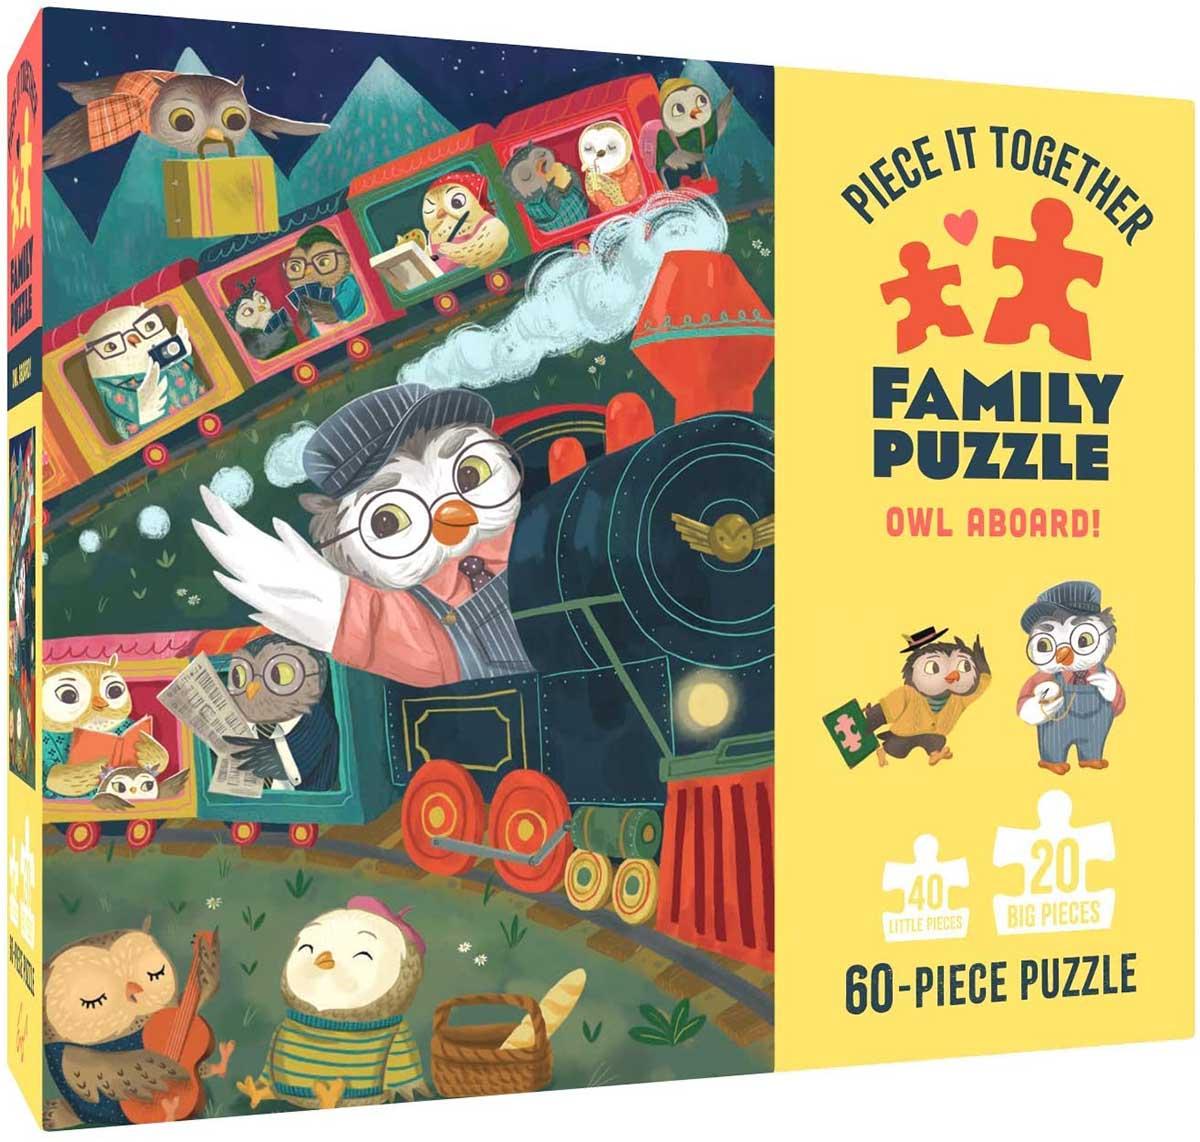 Owl Aboard! Trains Jigsaw Puzzle